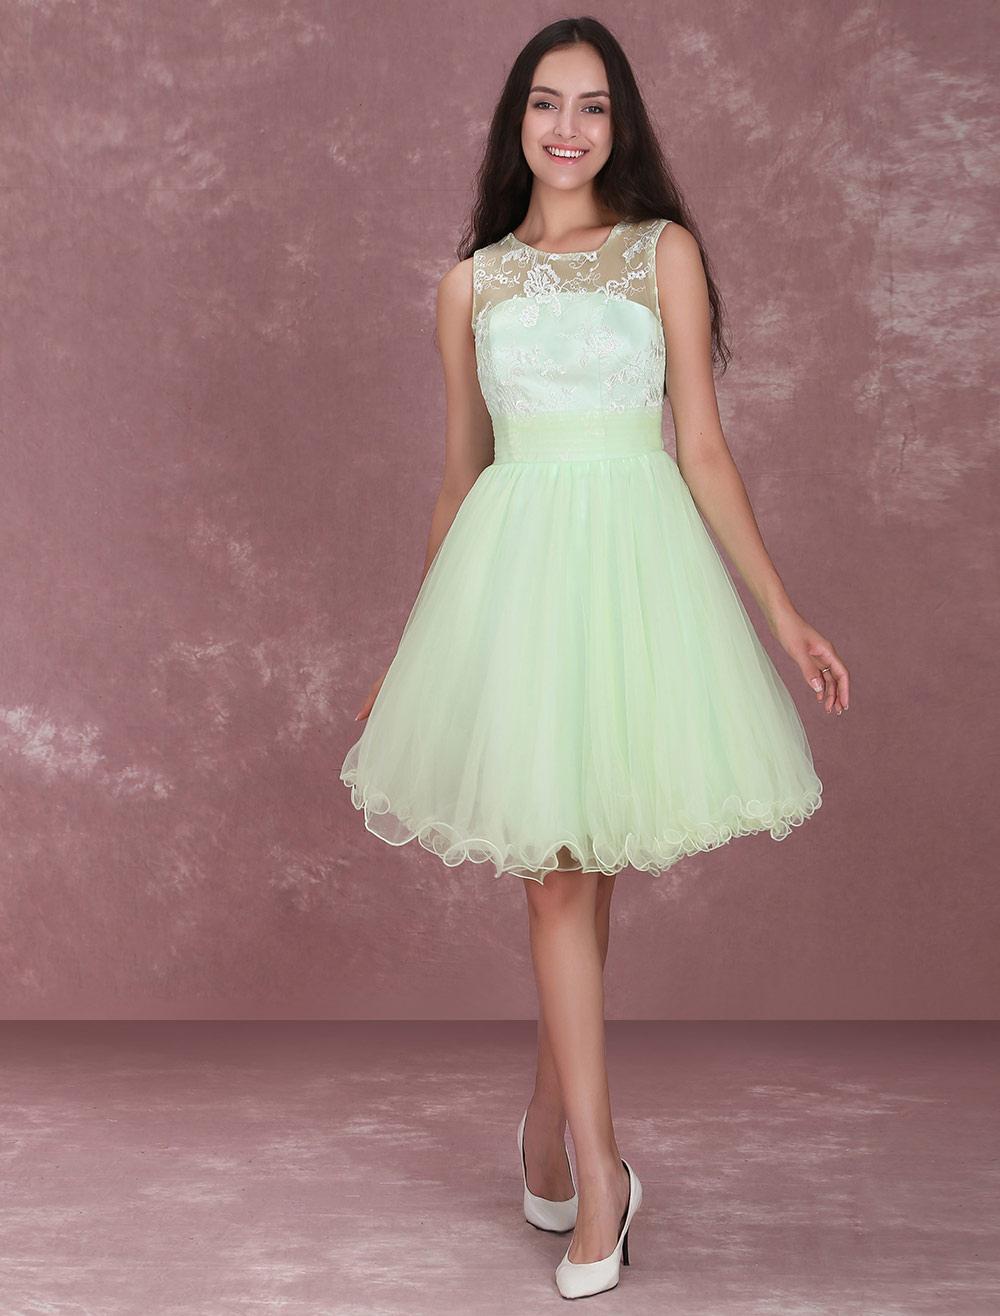 Light Green A-Line Lace Tulle Bridesmaid Dress (Wedding Bridesmaid Dresses) photo